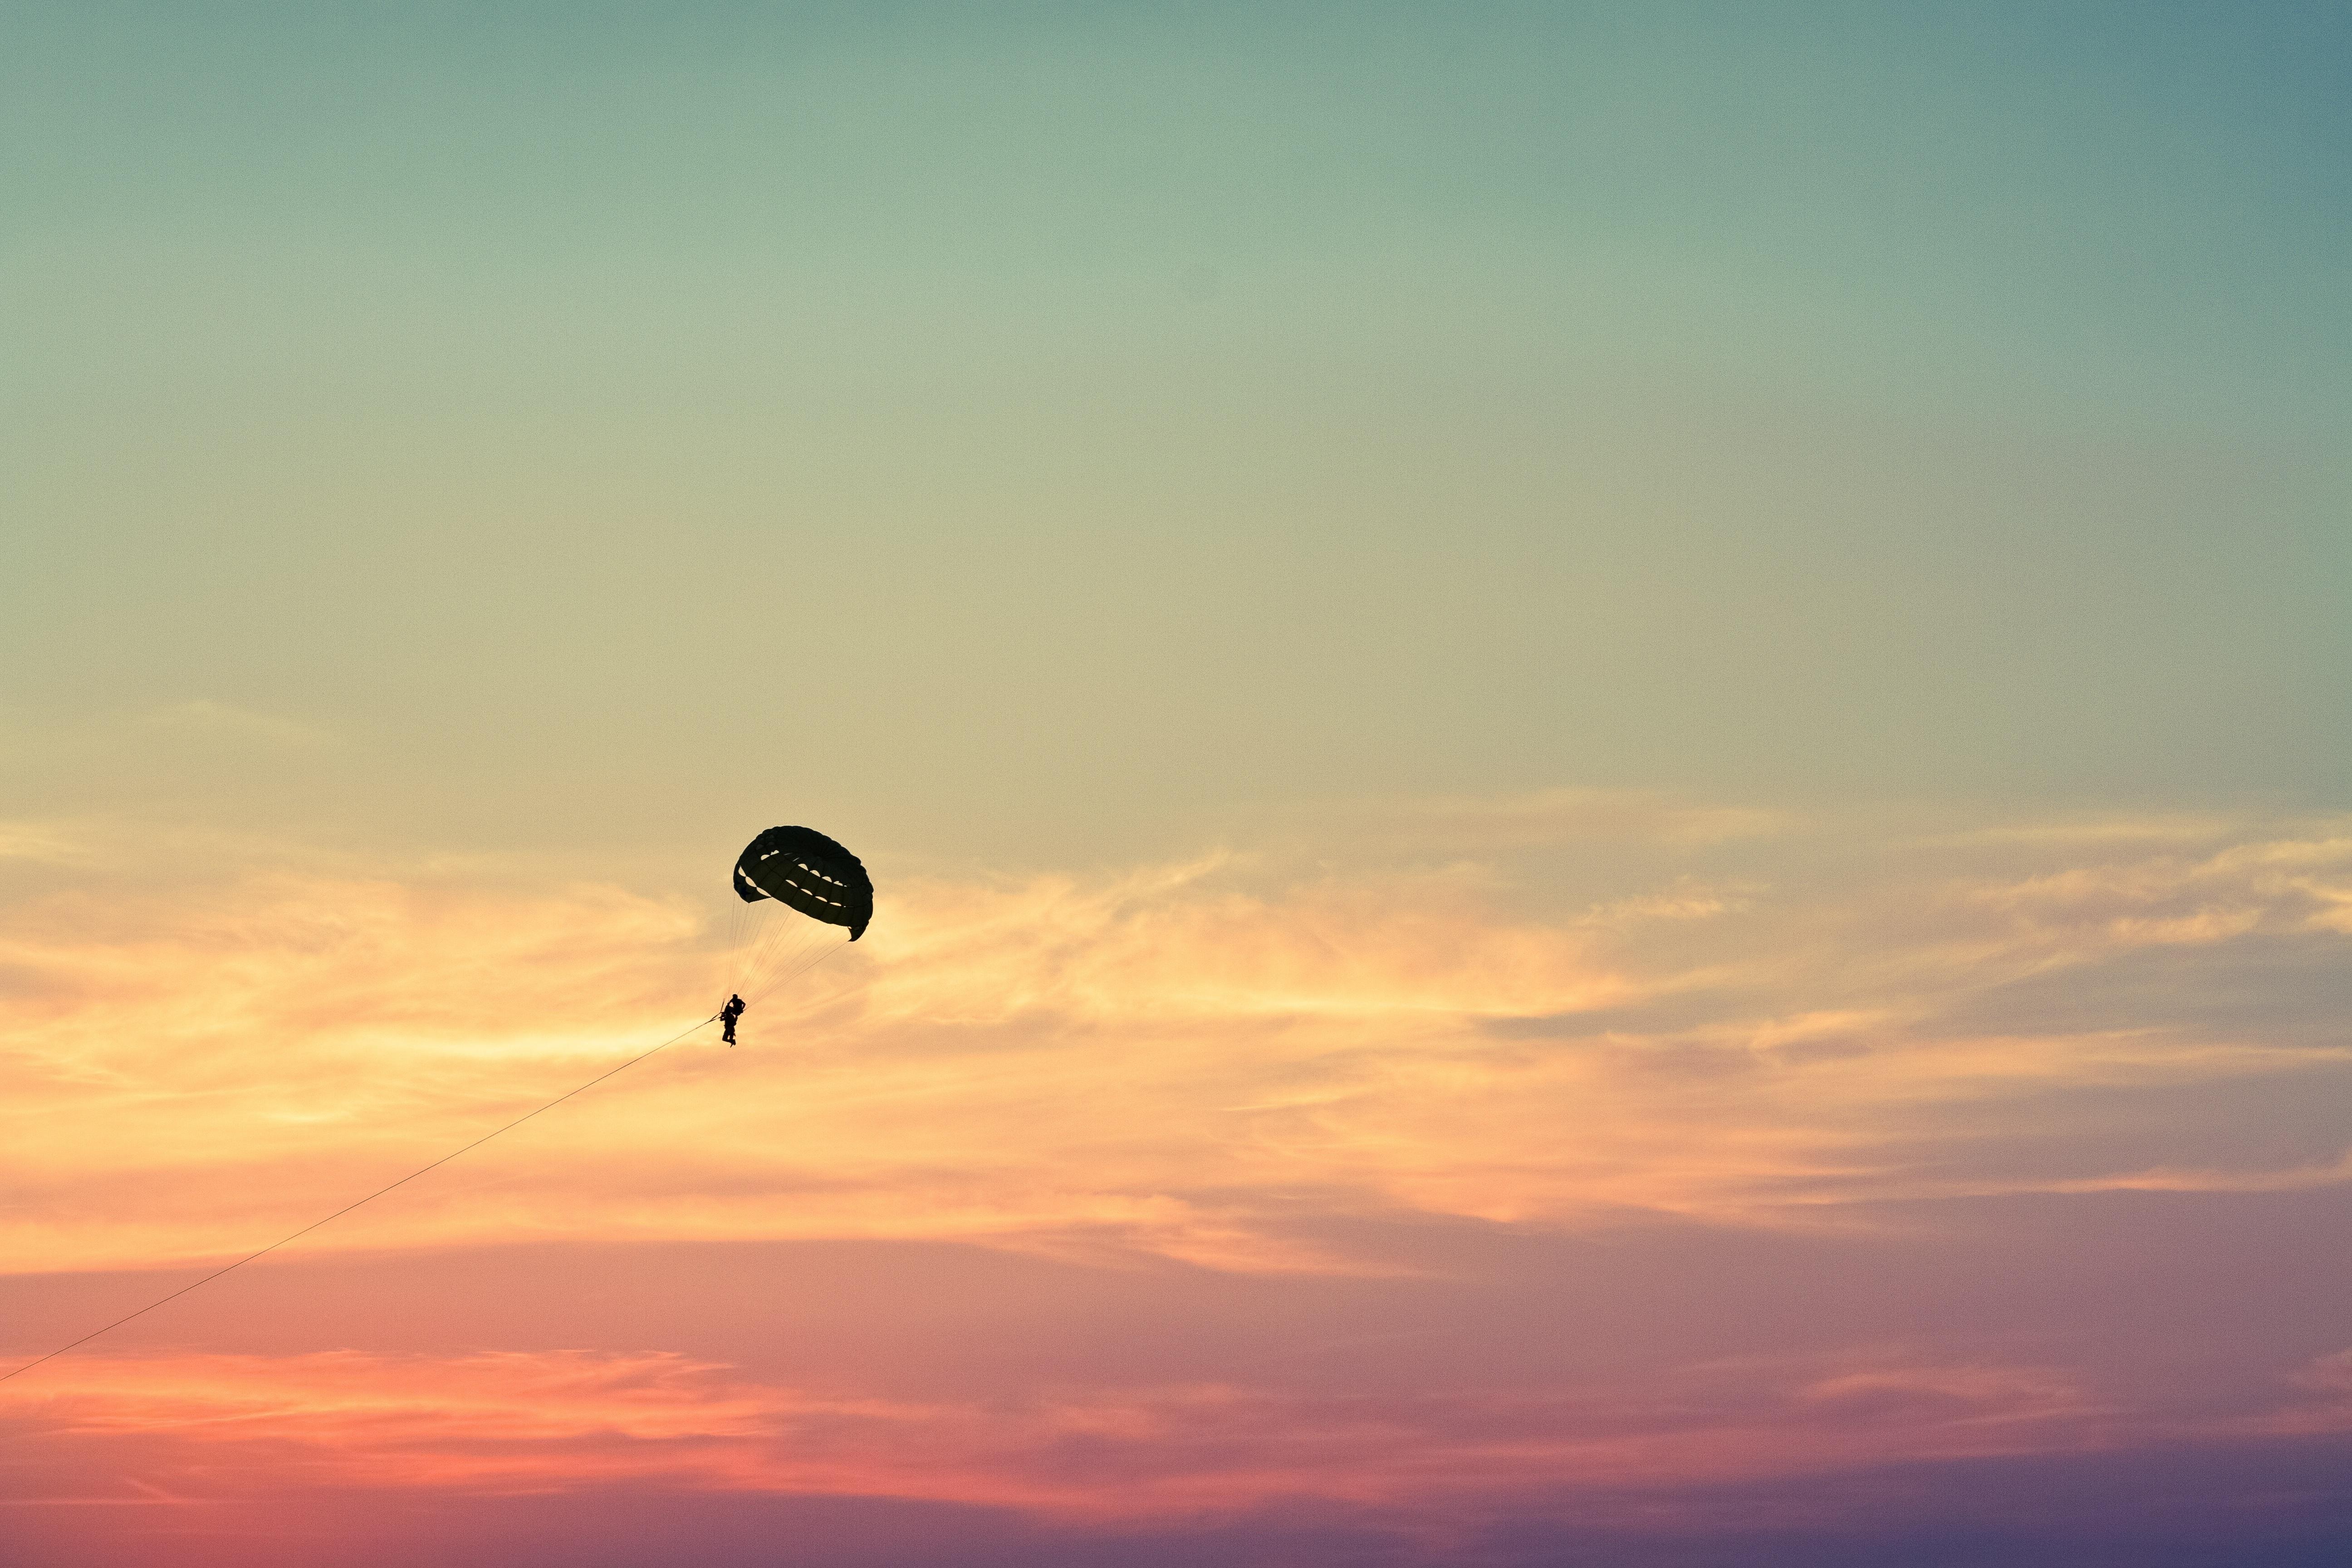 Paragliding Background